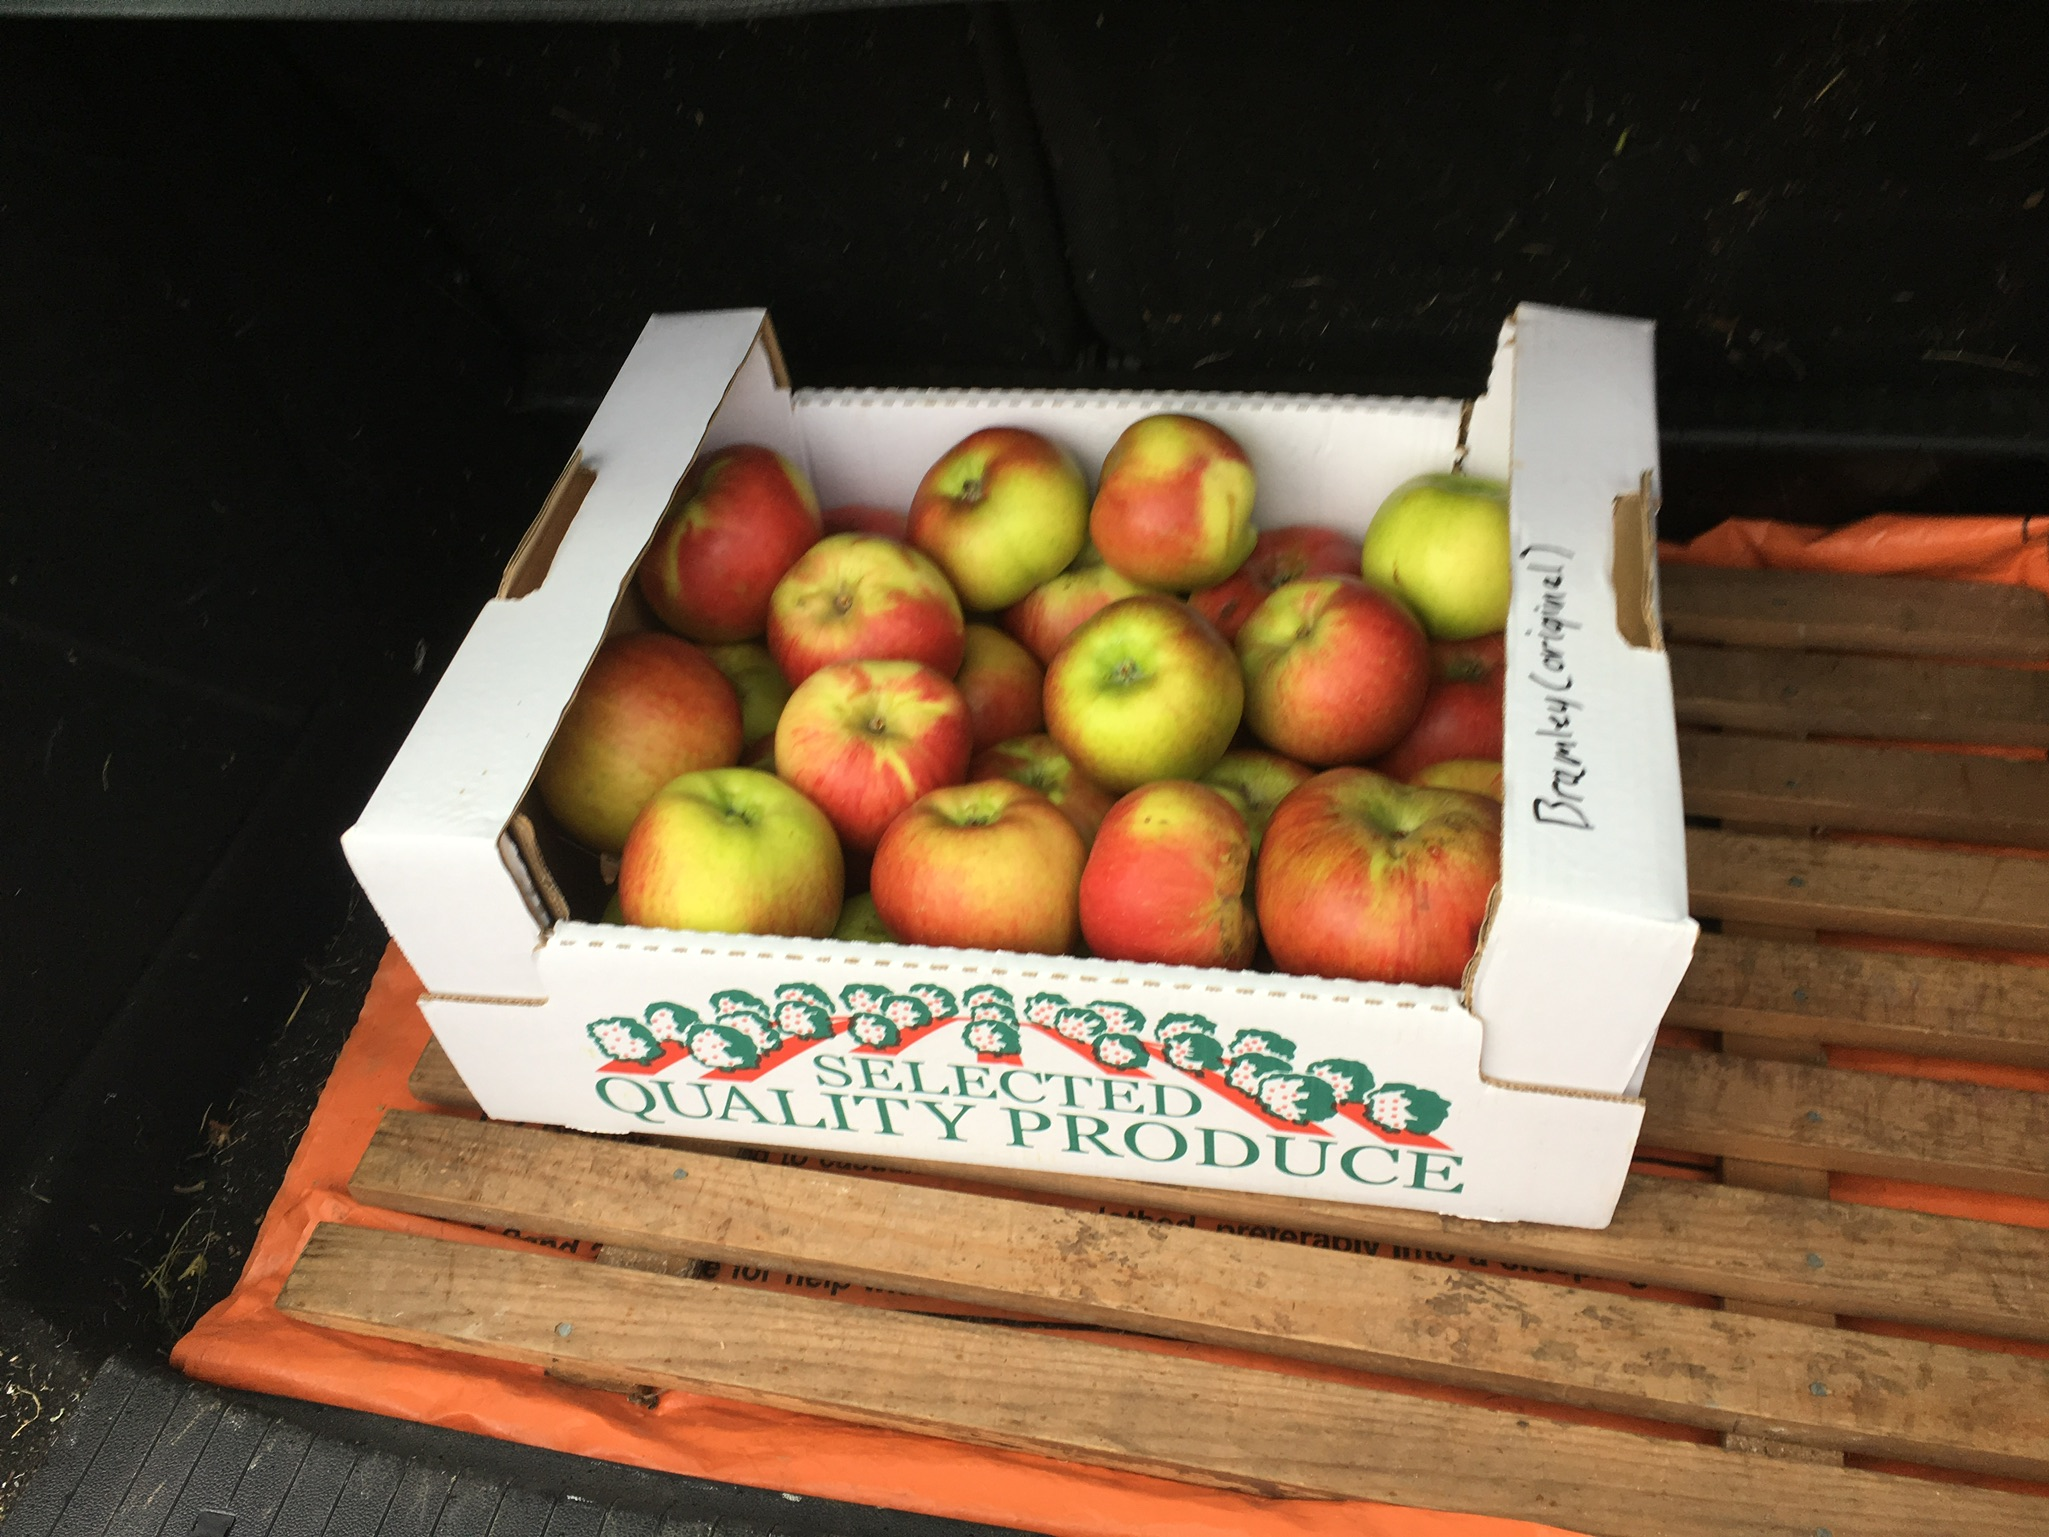 Bramley apples, locally grown